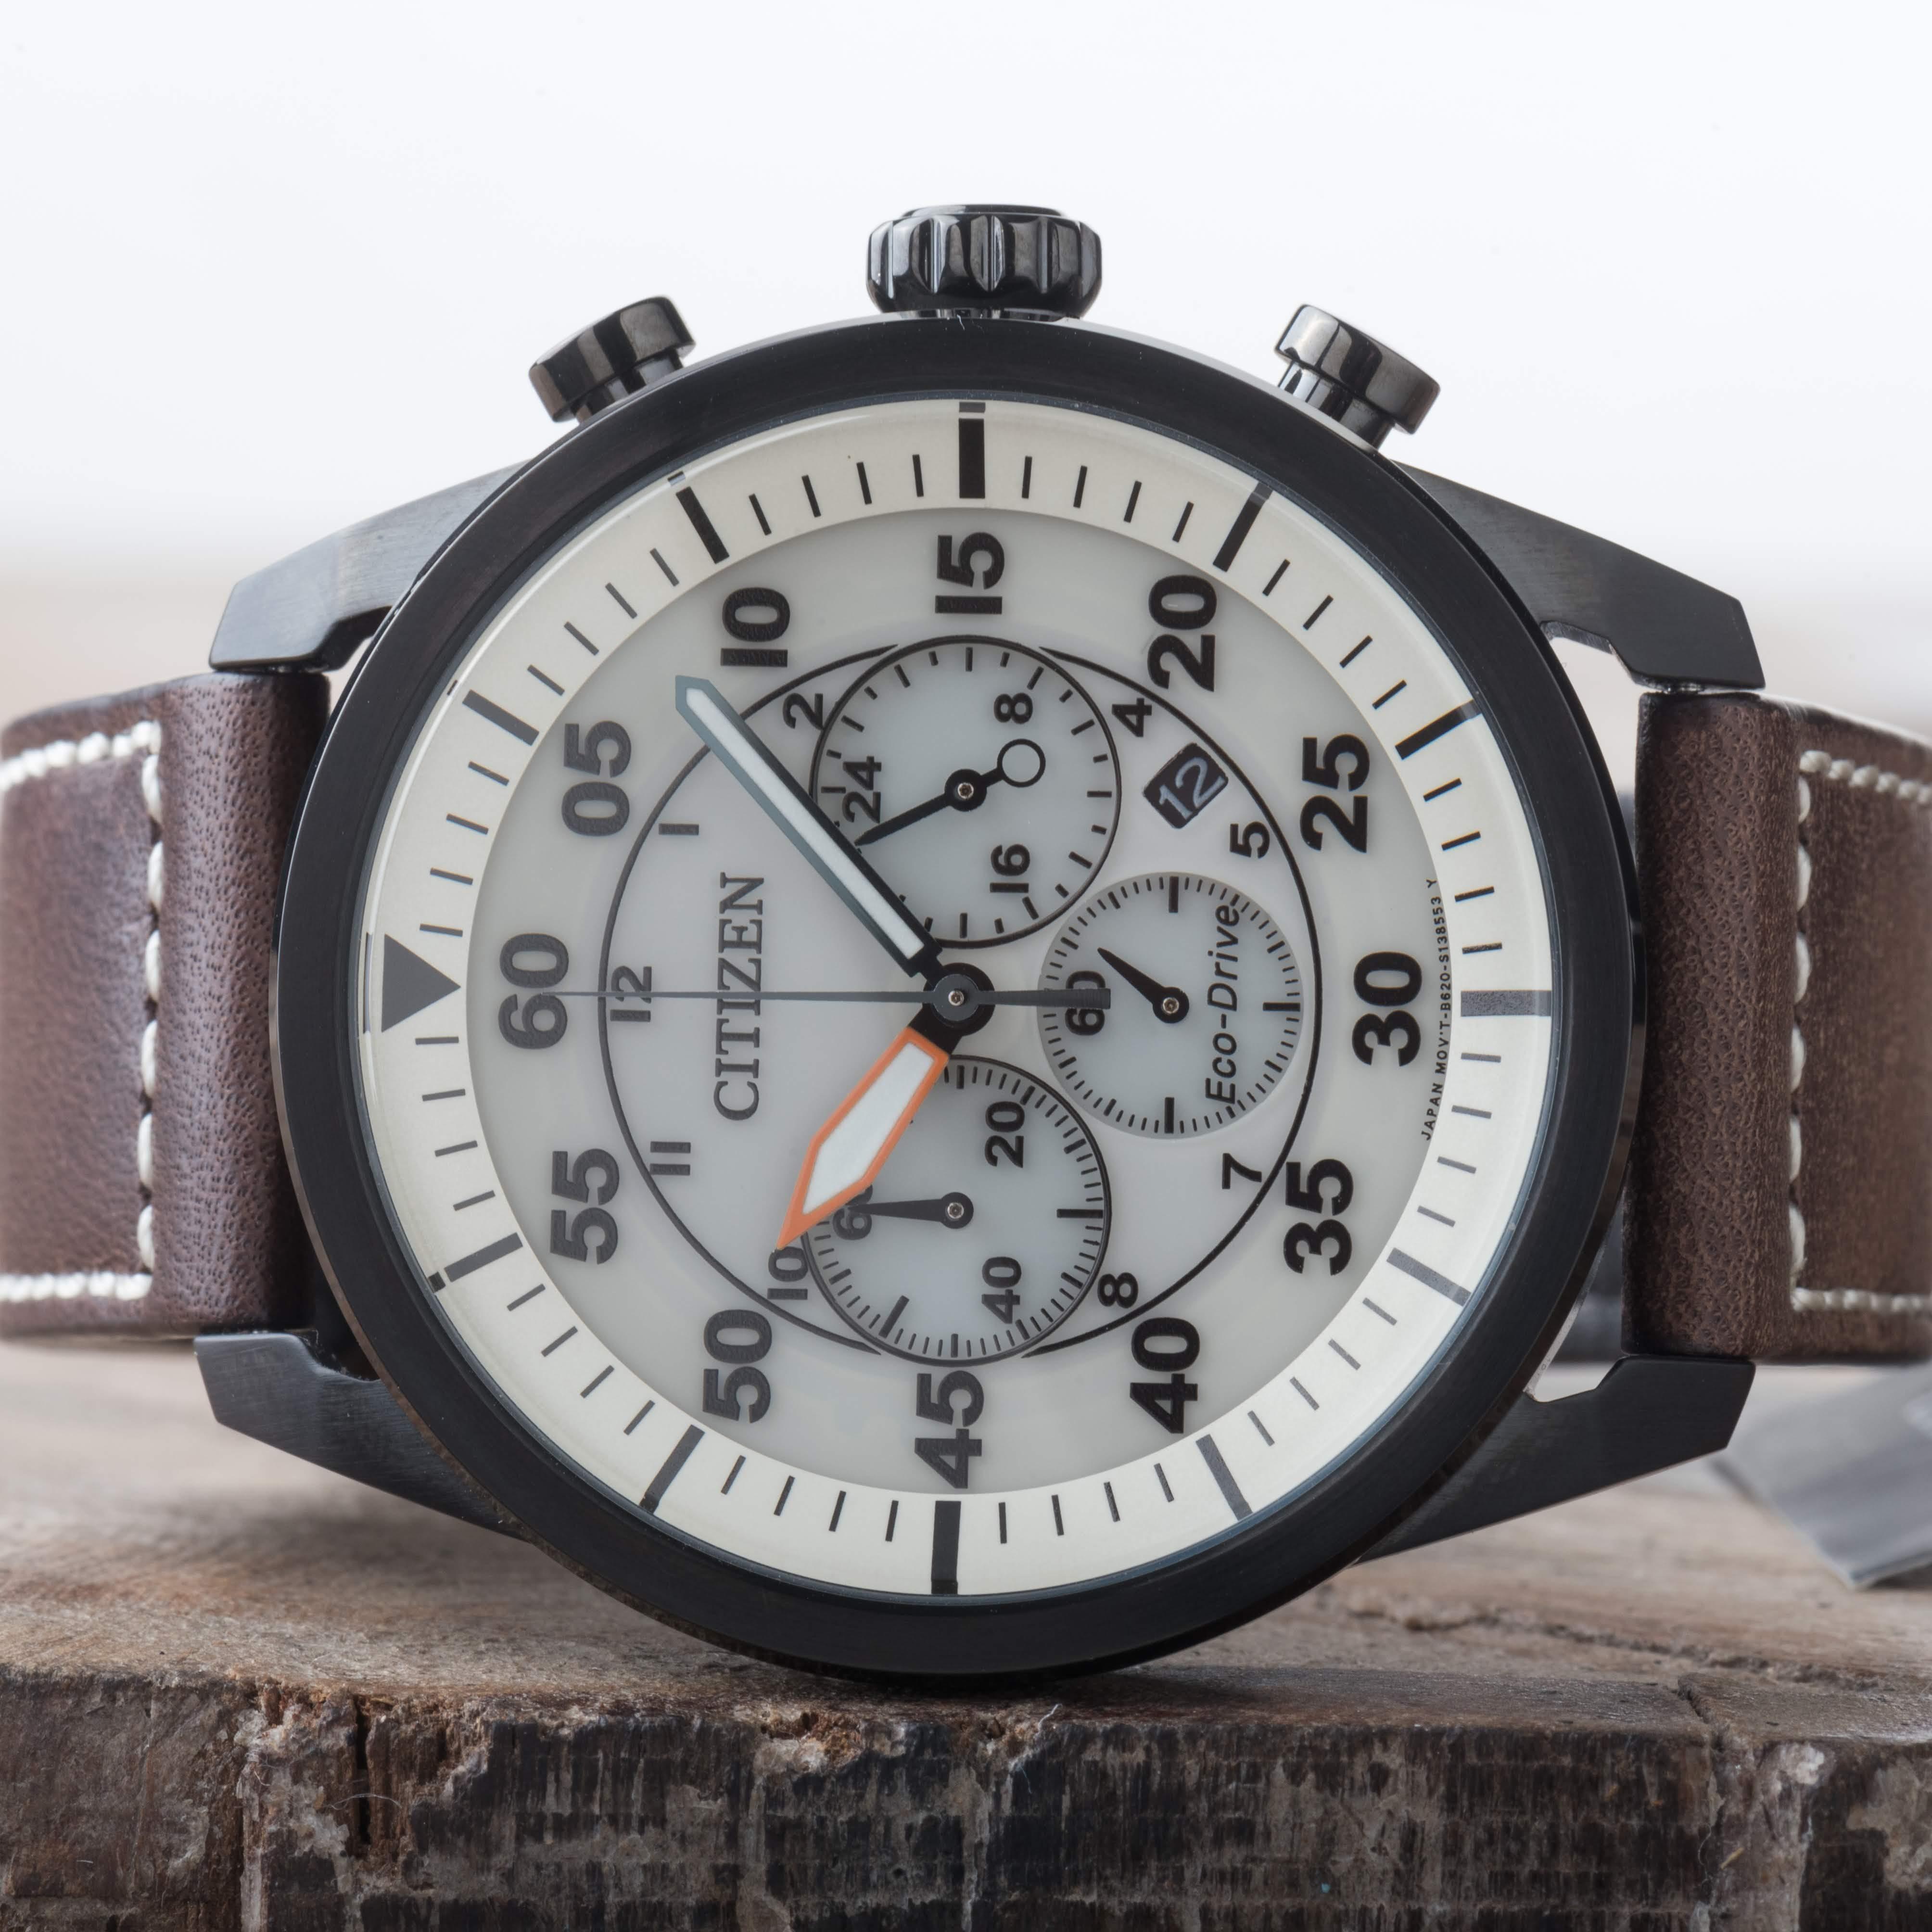 Citizen Eco-Drive Aviator Chronograph Date Men's Watch CA4215-04W